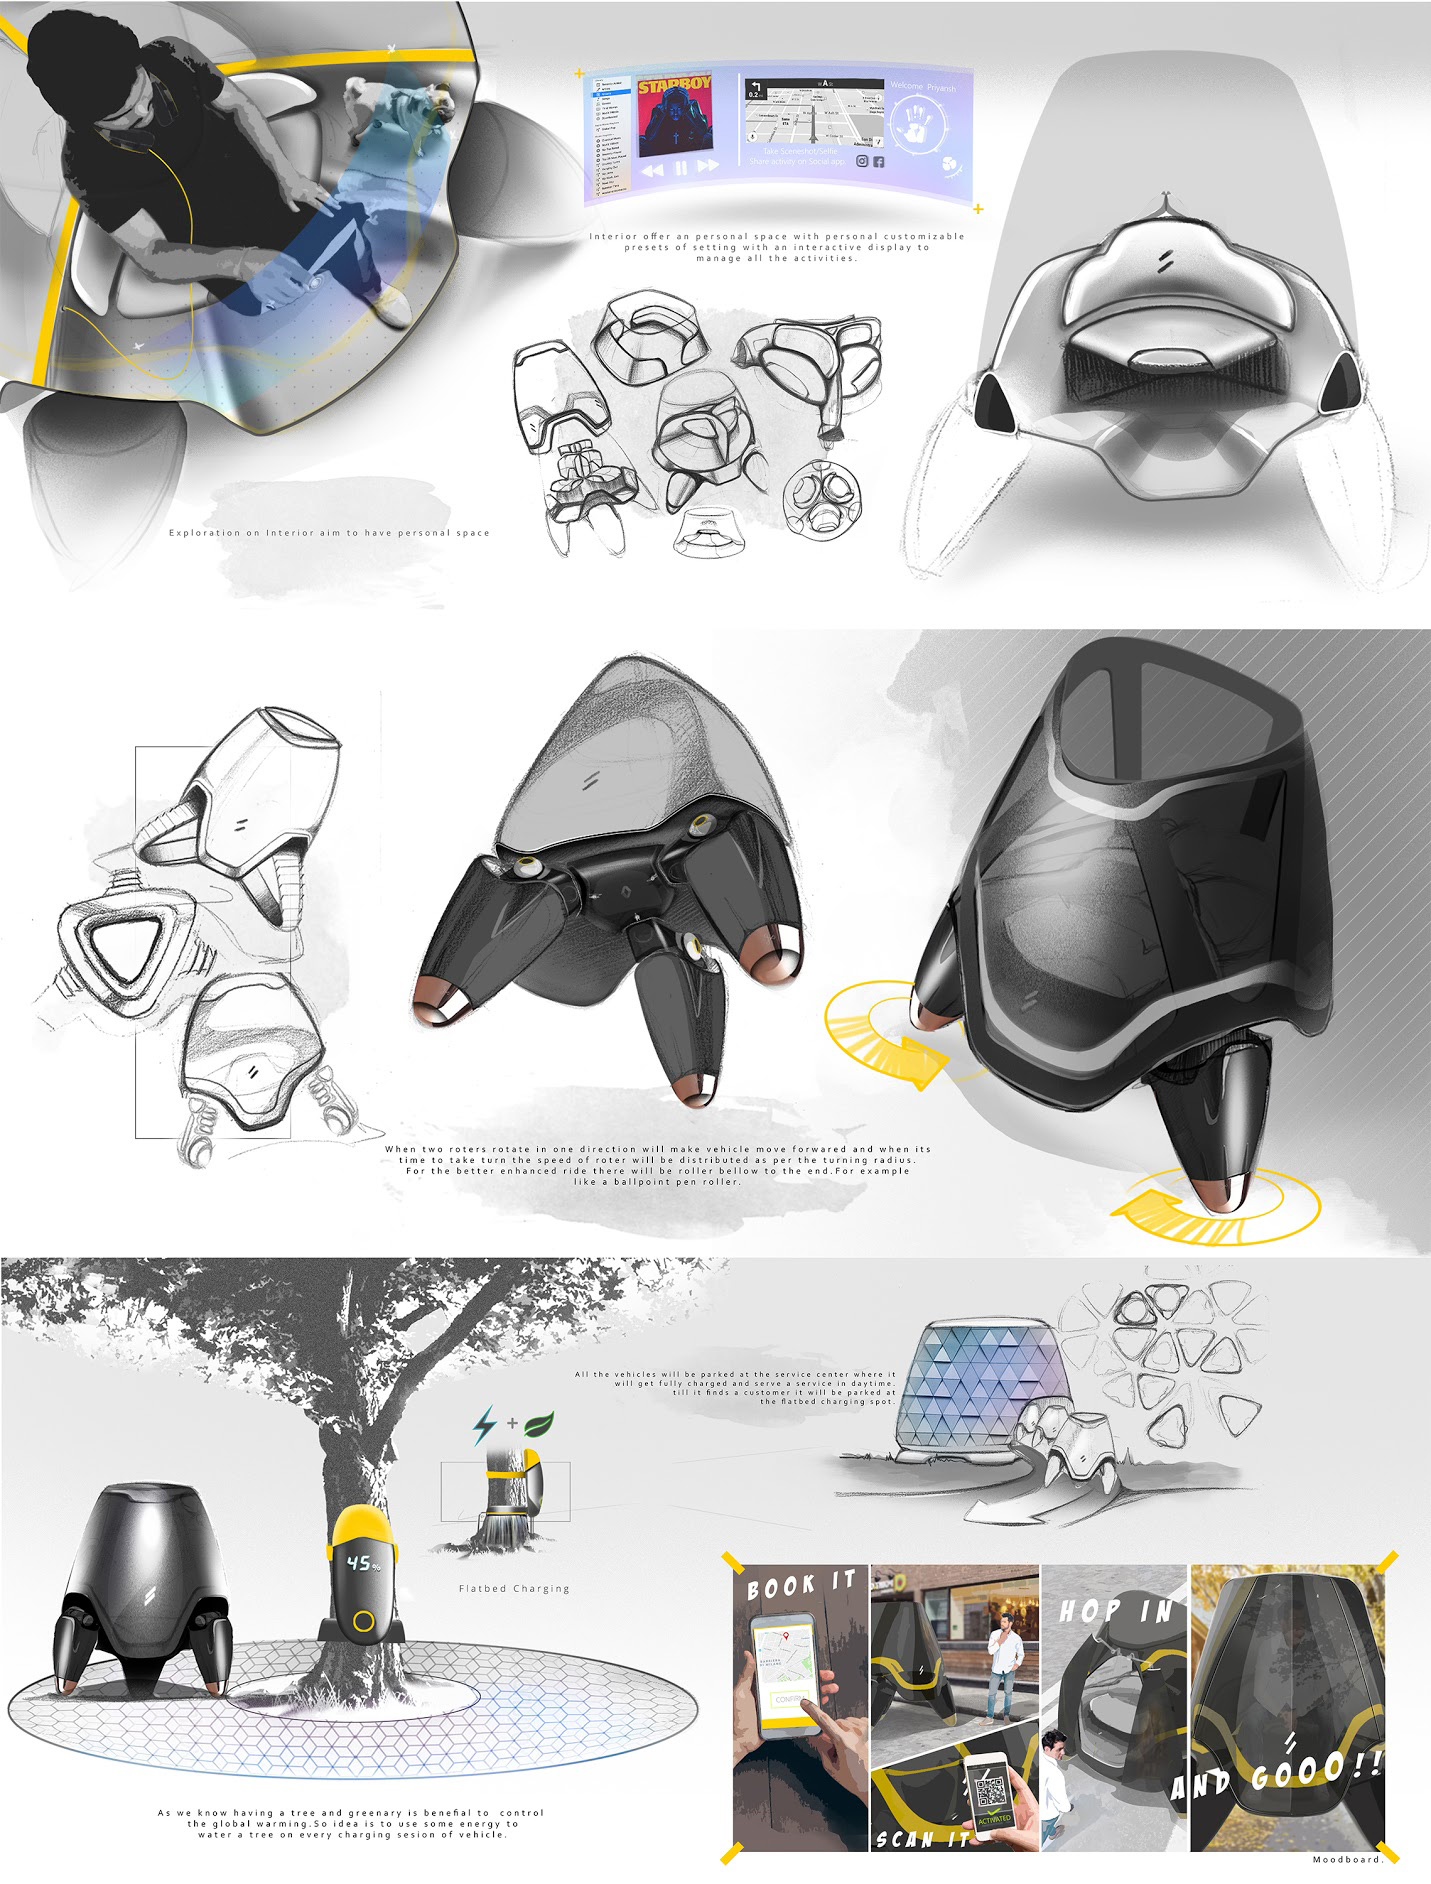 Renault TRIO by Aditya Arun Surti, India | Michelin